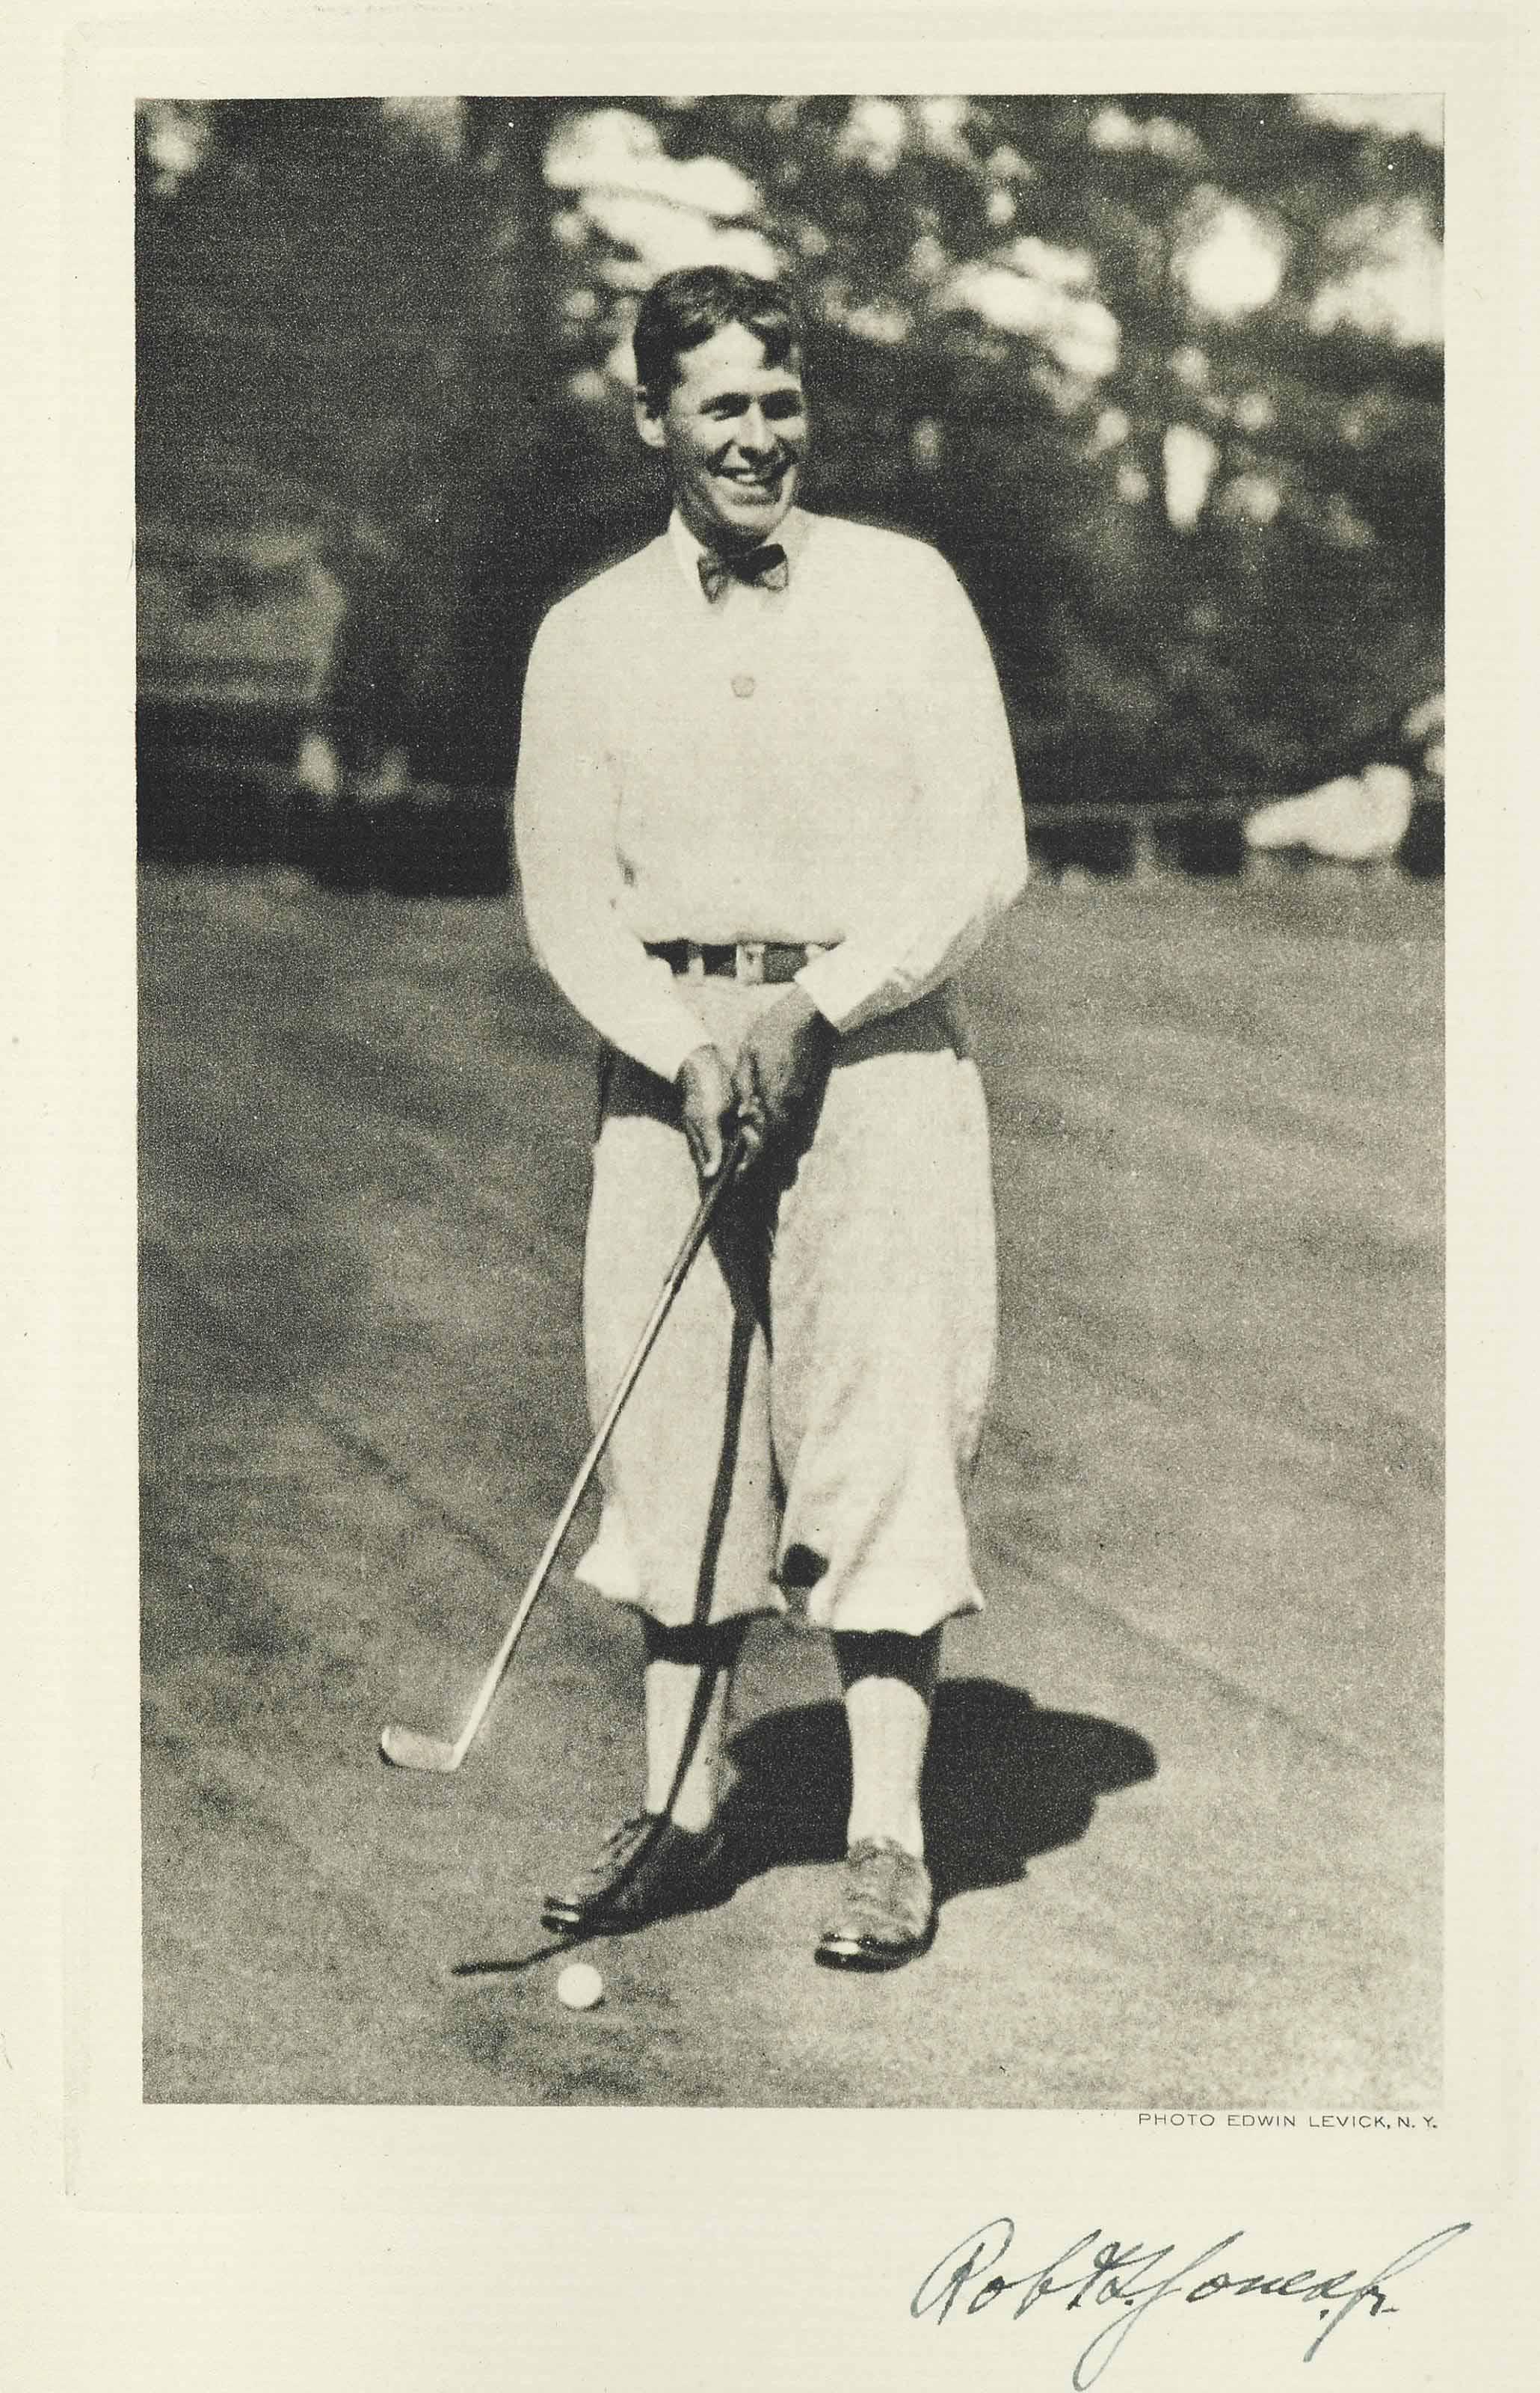 JONES, ROBERT TYRE ('BOBBY') & O.B. KEELER. DOWN THE FAIRWAY. THE GOLF LIFE AND PLAY OF ROBERT T. JONES, JR. NEW YORK: MINTON, BALCH, 1927.